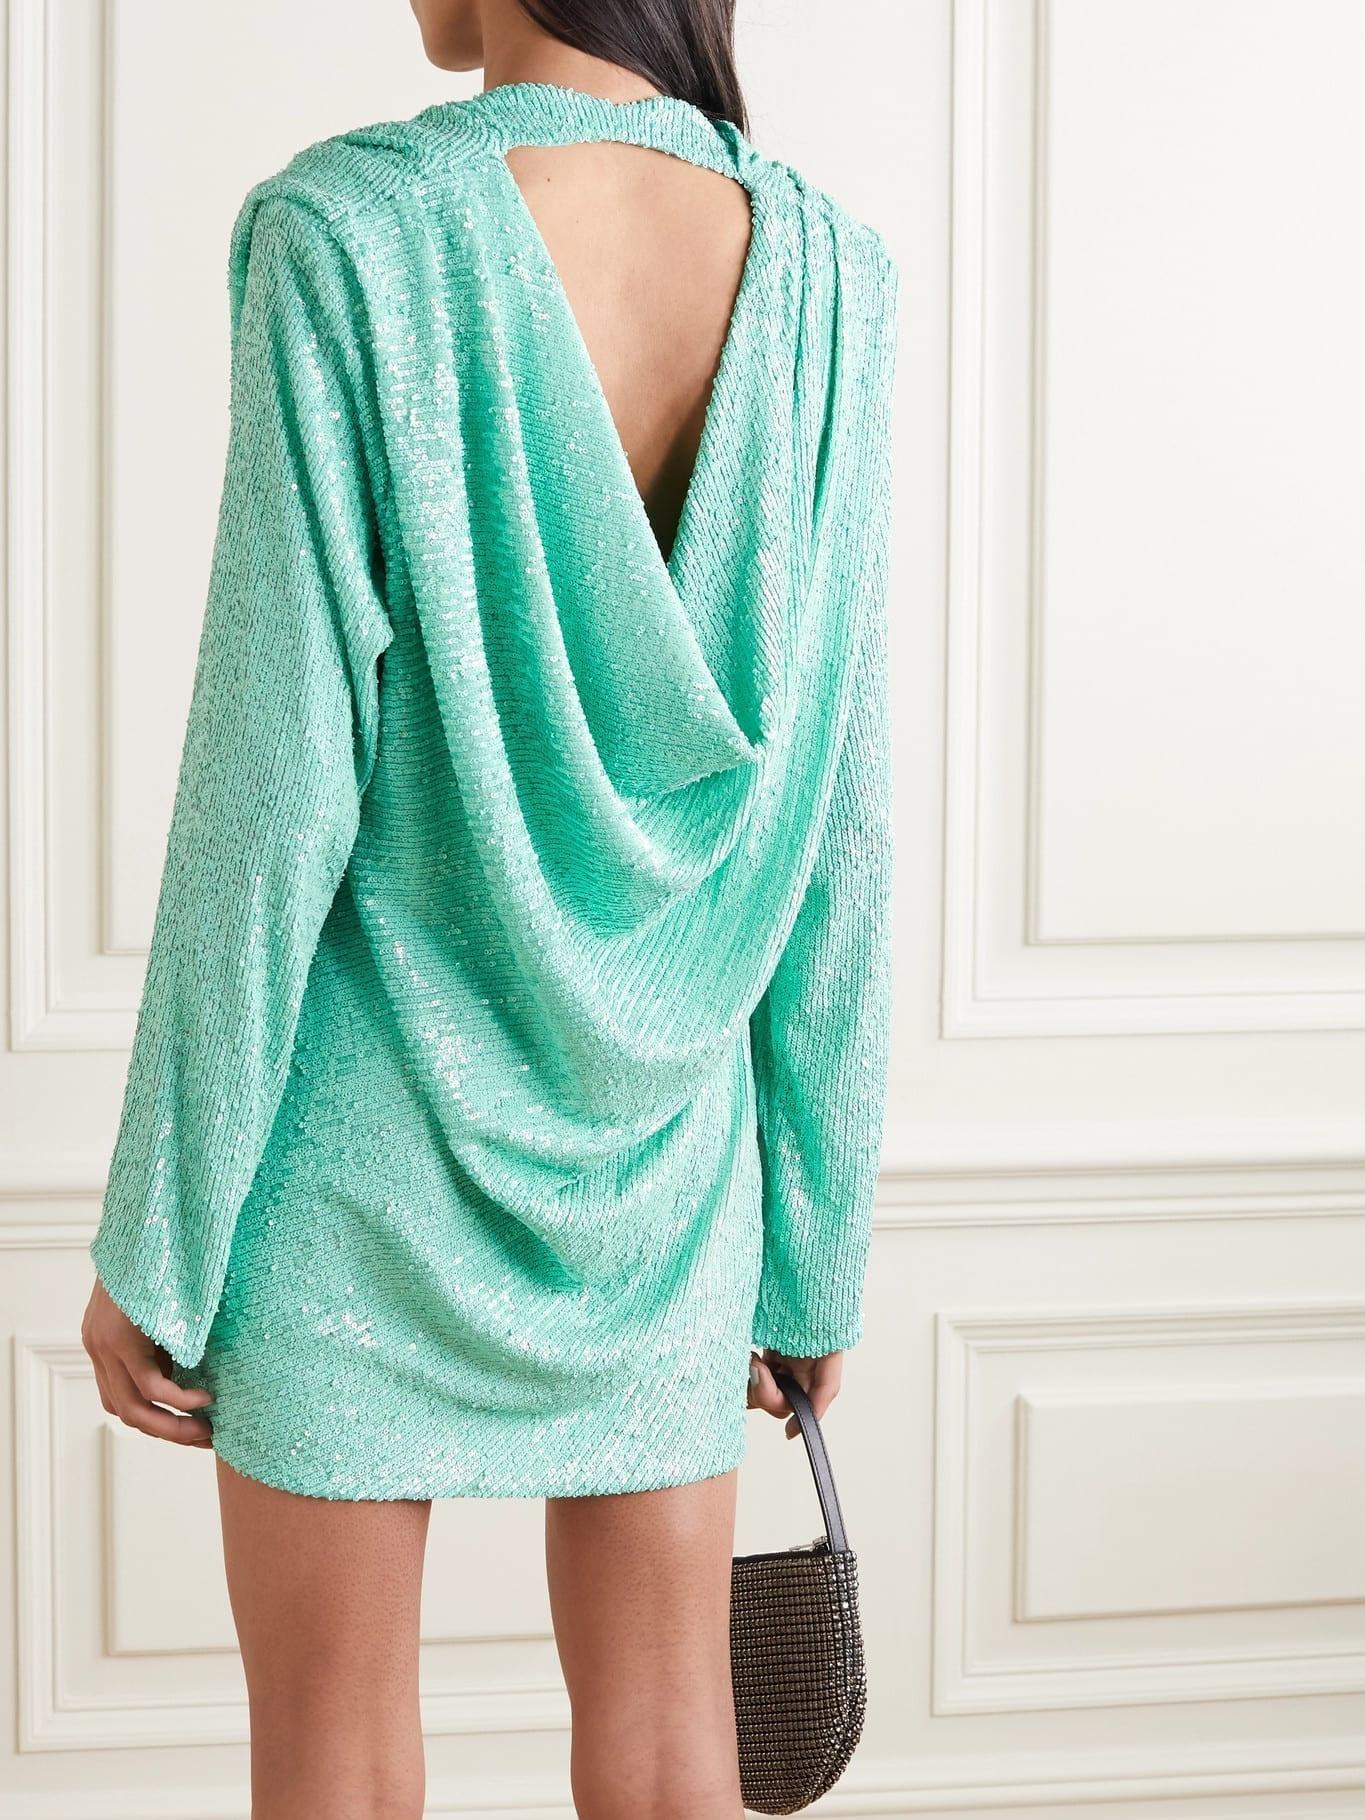 These Mini Dresses Are Guaranteed To Break Necks